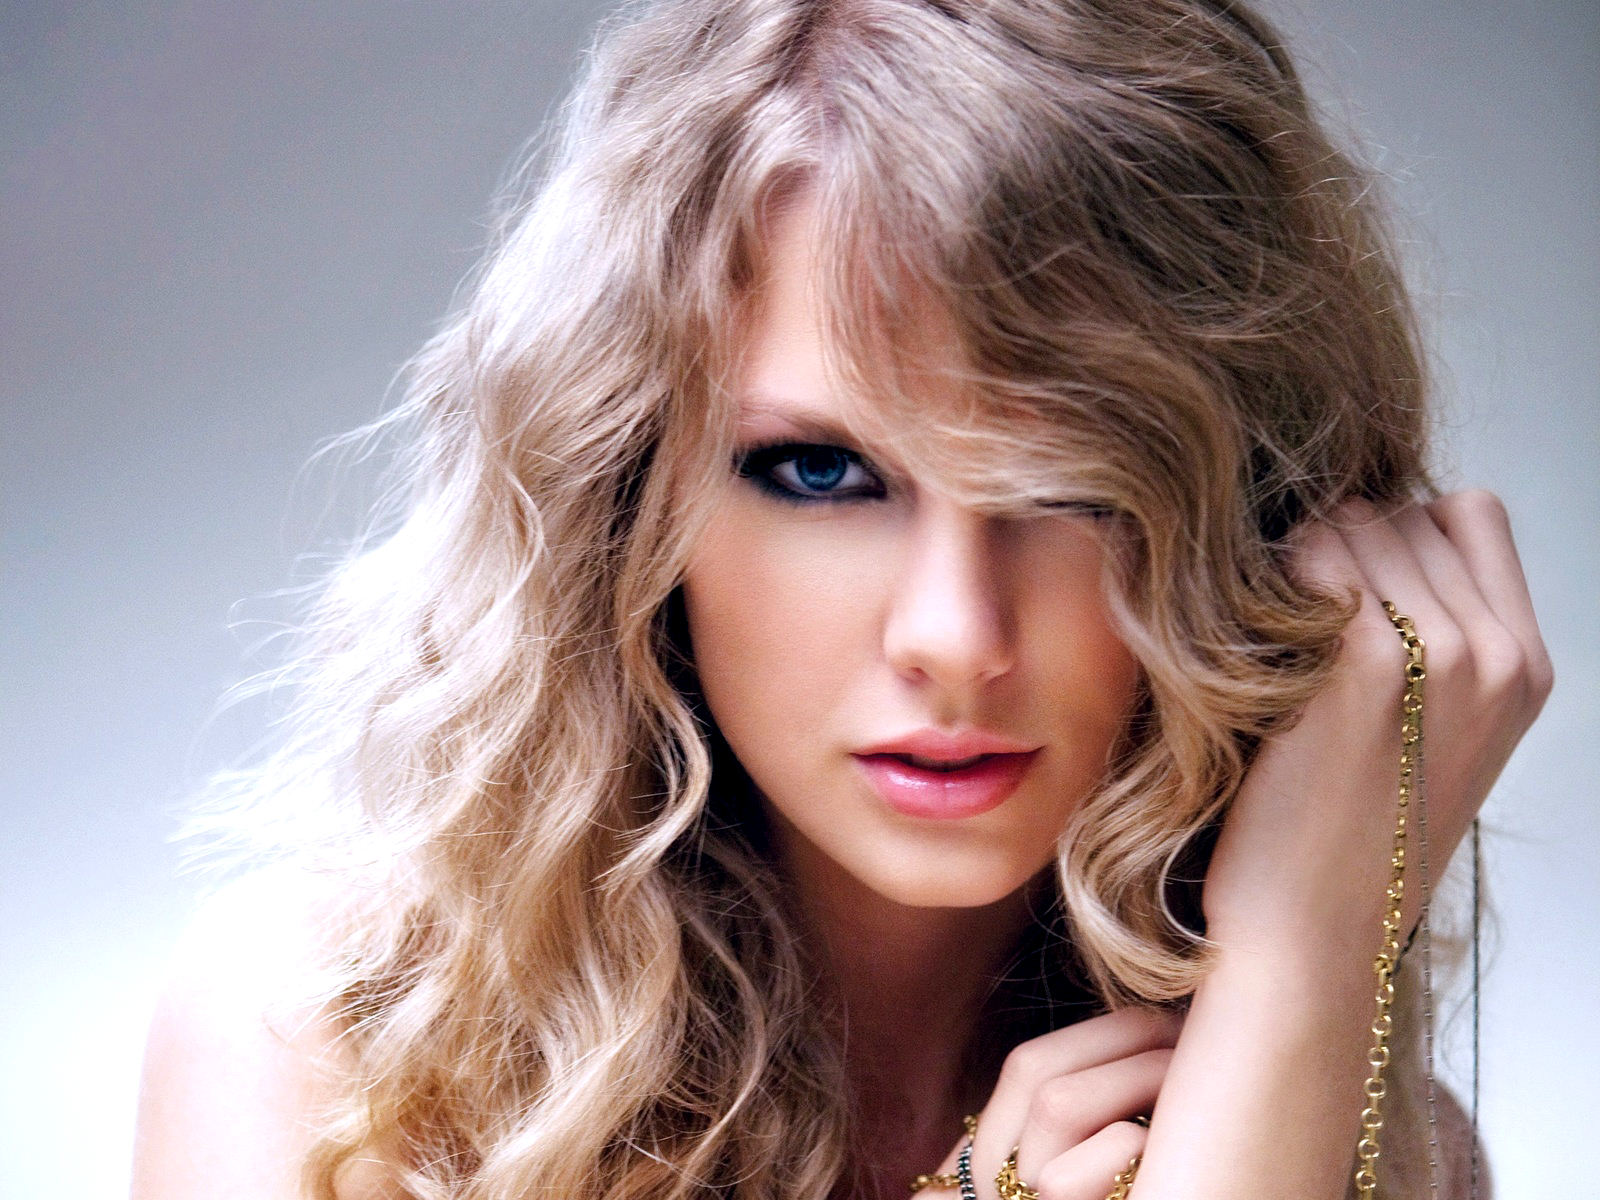 Taylor Swifts Evolving Beauty